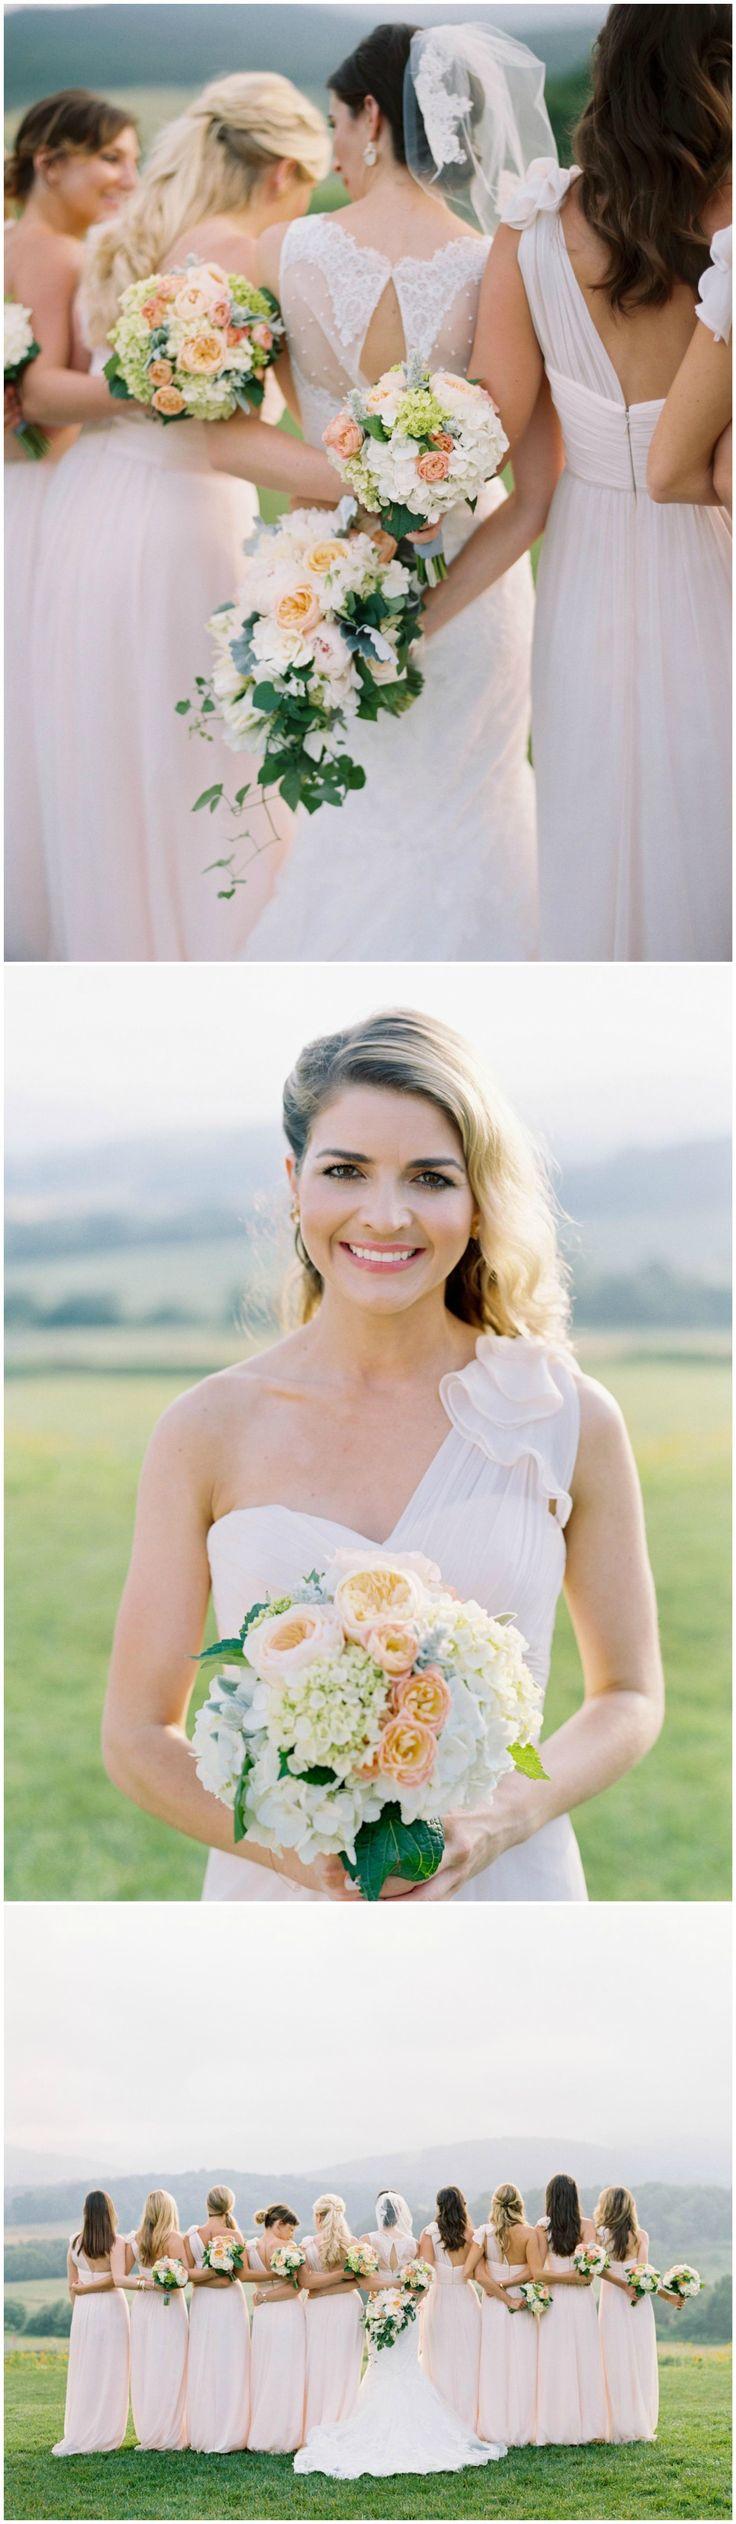 Pastel pink bridesmaid dresses, one-shoulder gowns, soft peach floral wedding bouquets, classic Virginia wedding // Elisa Bricker